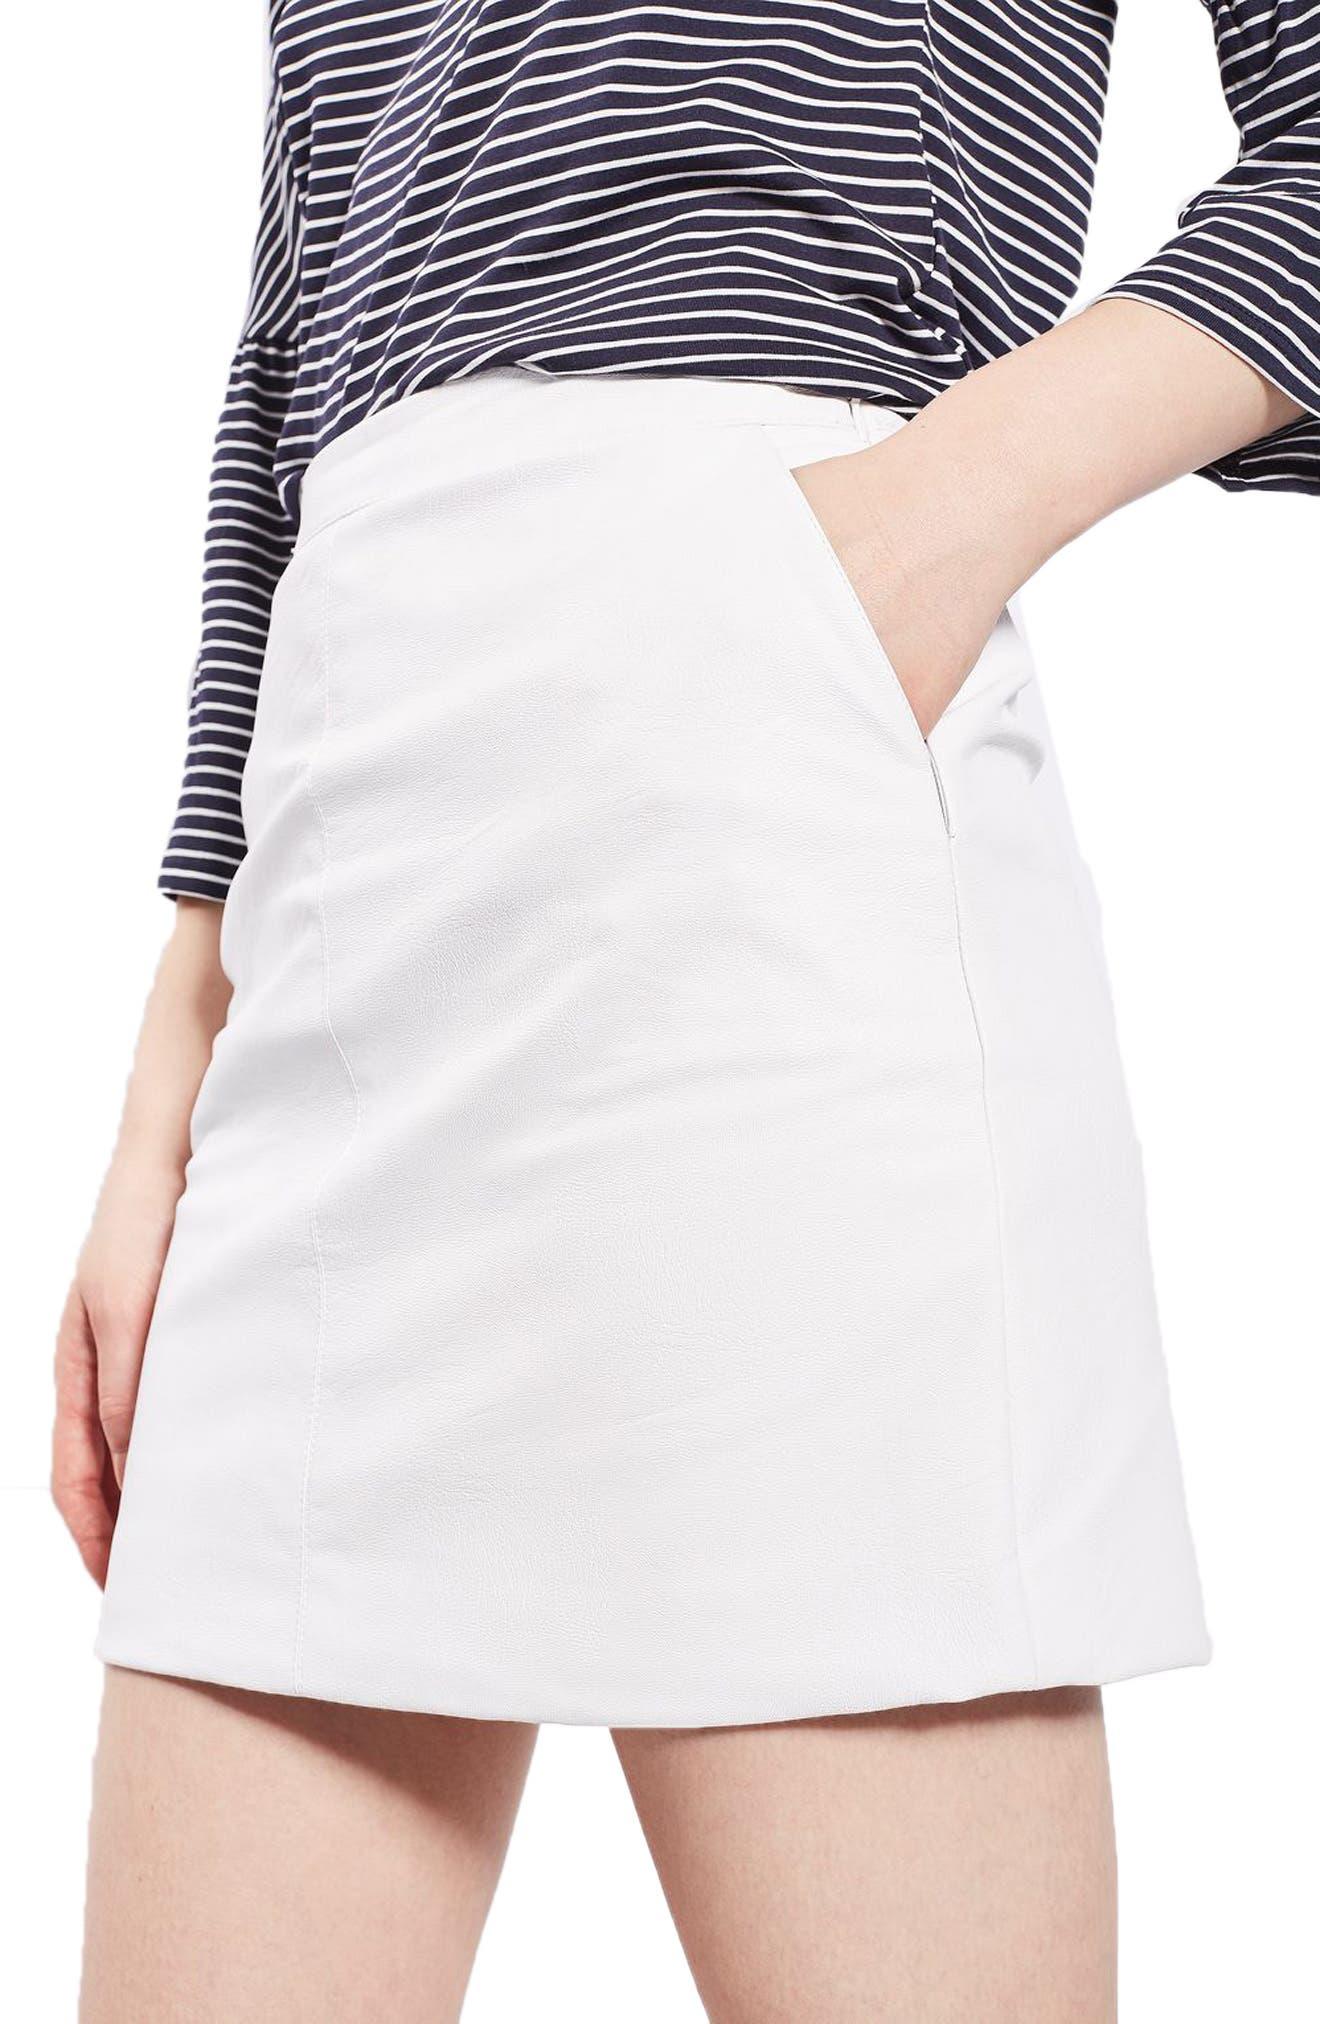 Alternate Image 1 Selected - Topshop Faux Leather Pencil Skirt (Regular & Petite)